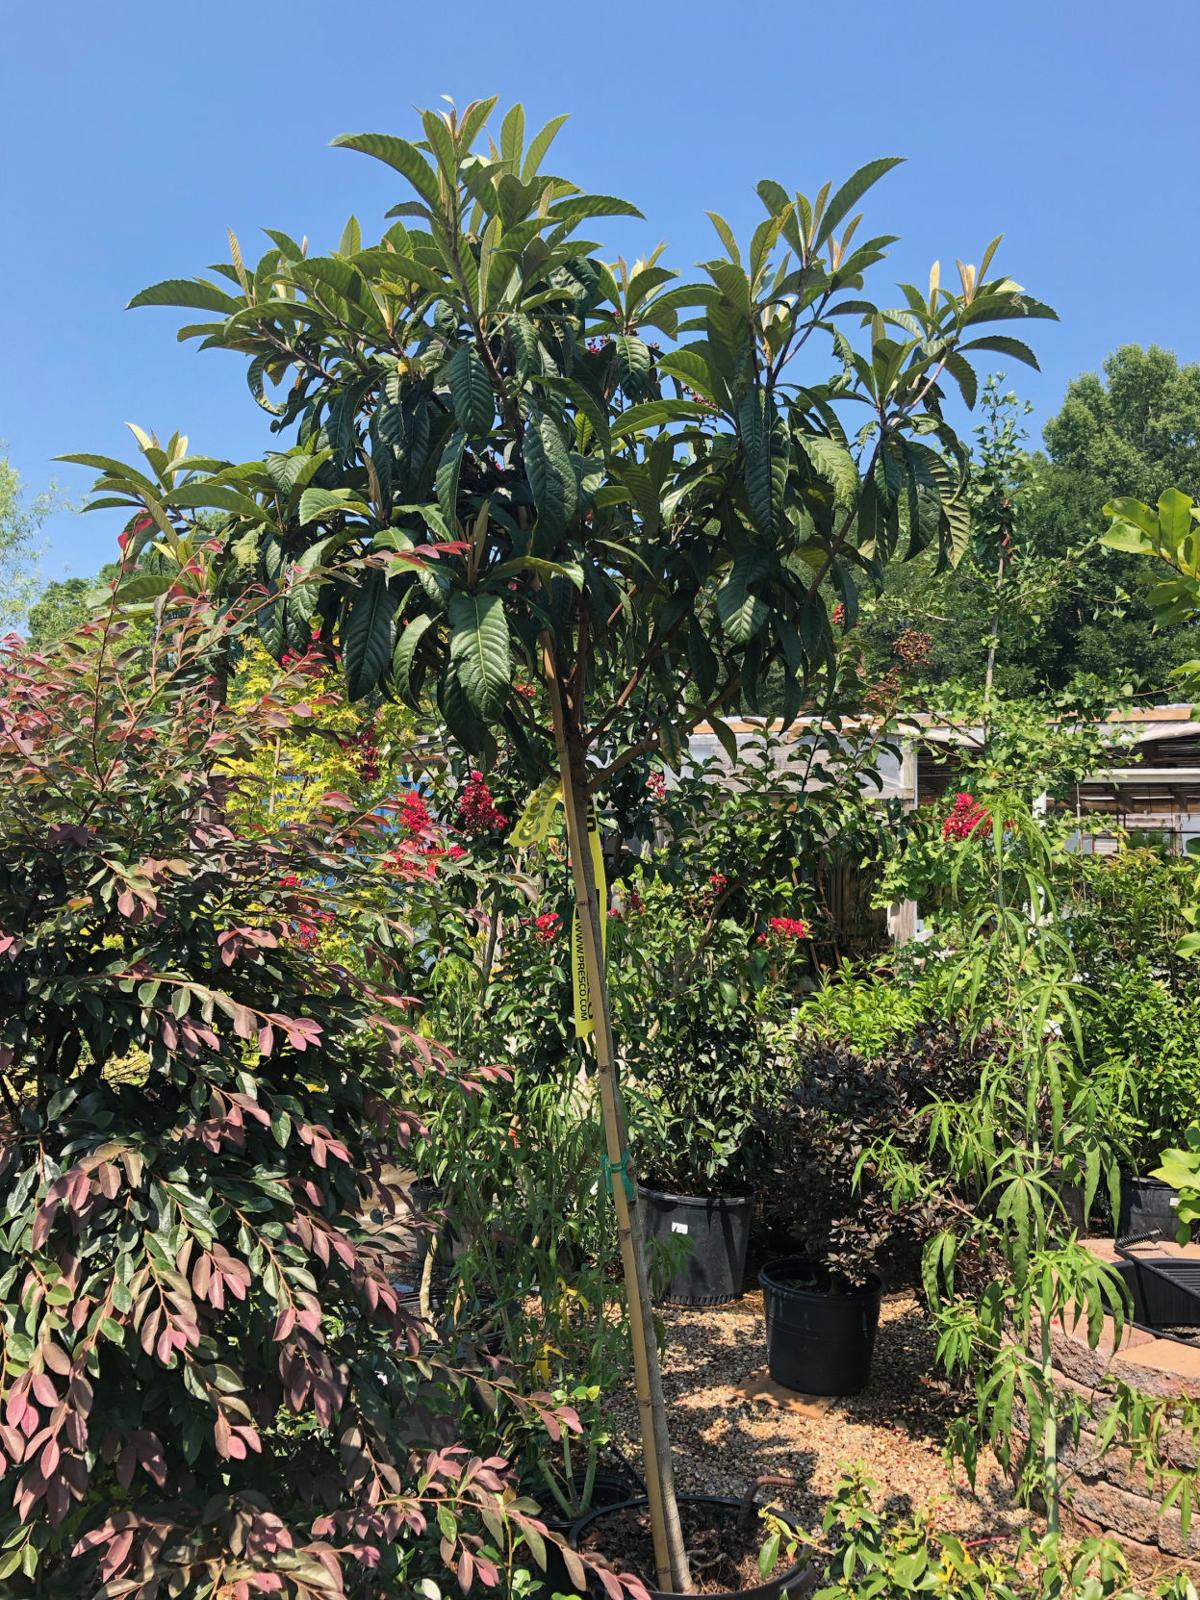 Gardening Loquat trees